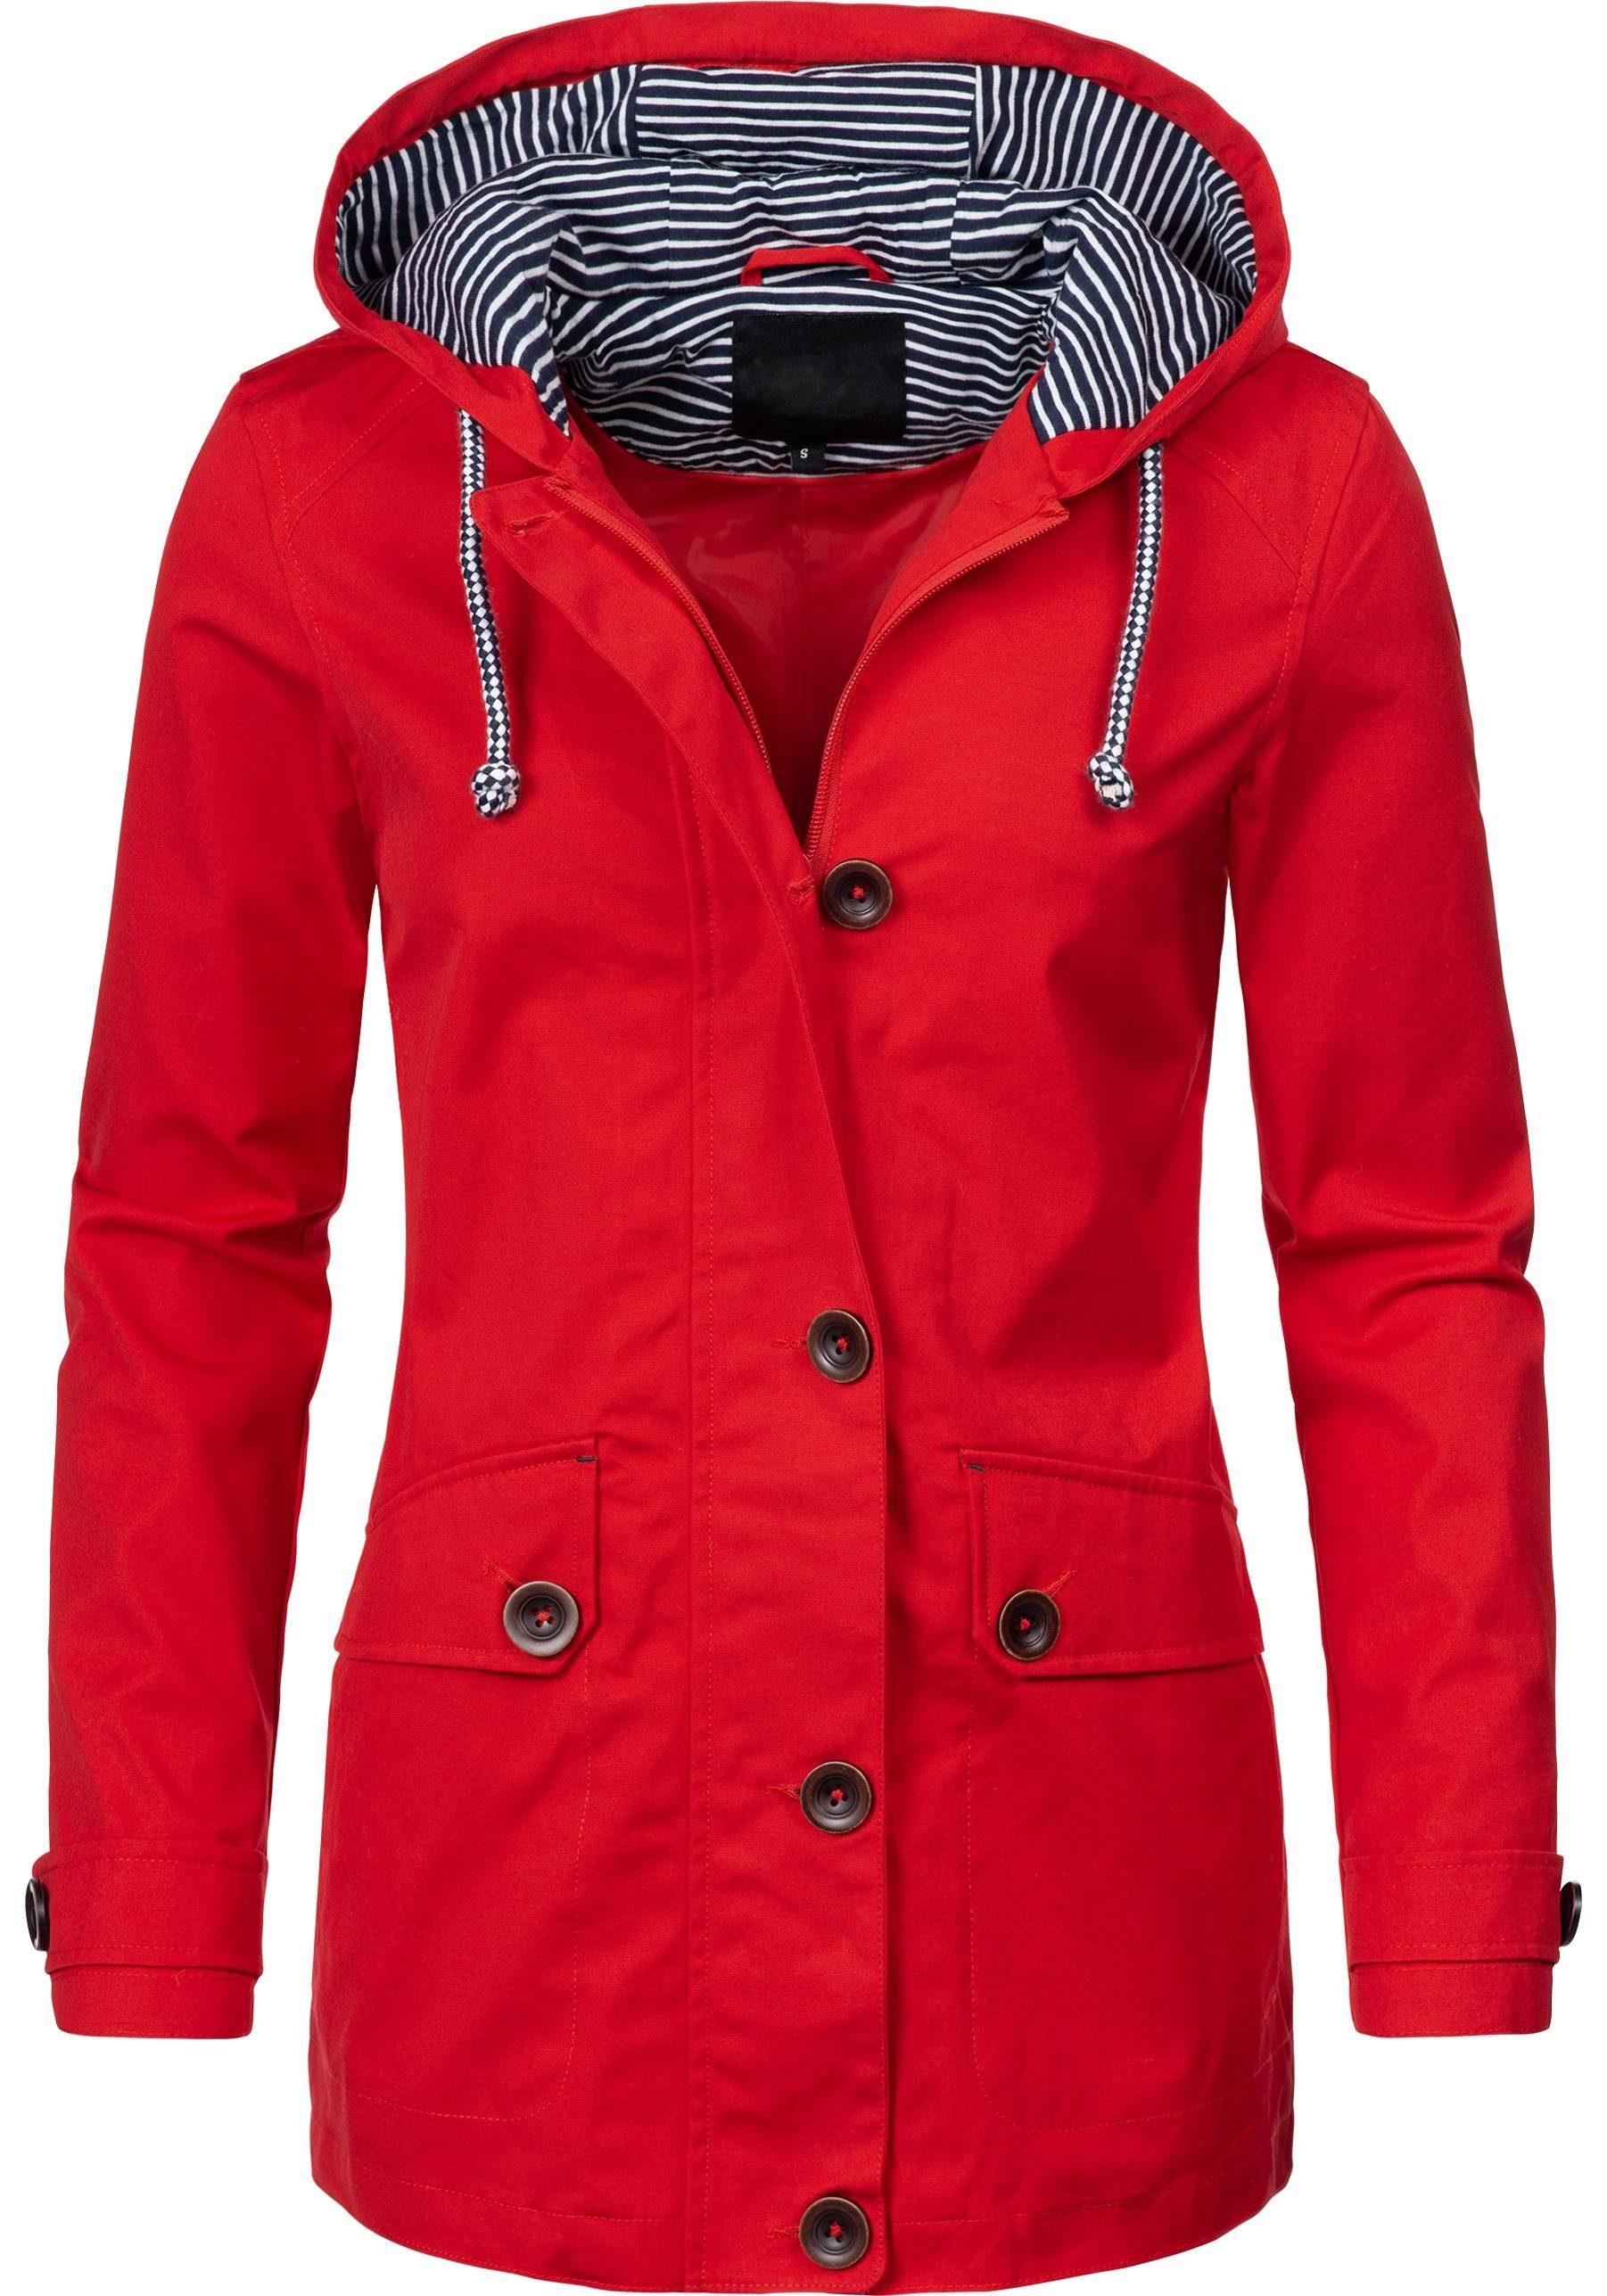 PEAK TIME Parka »L60012« modische Damen Baumwolljacke Übergangsjacke online kaufen | OTTO